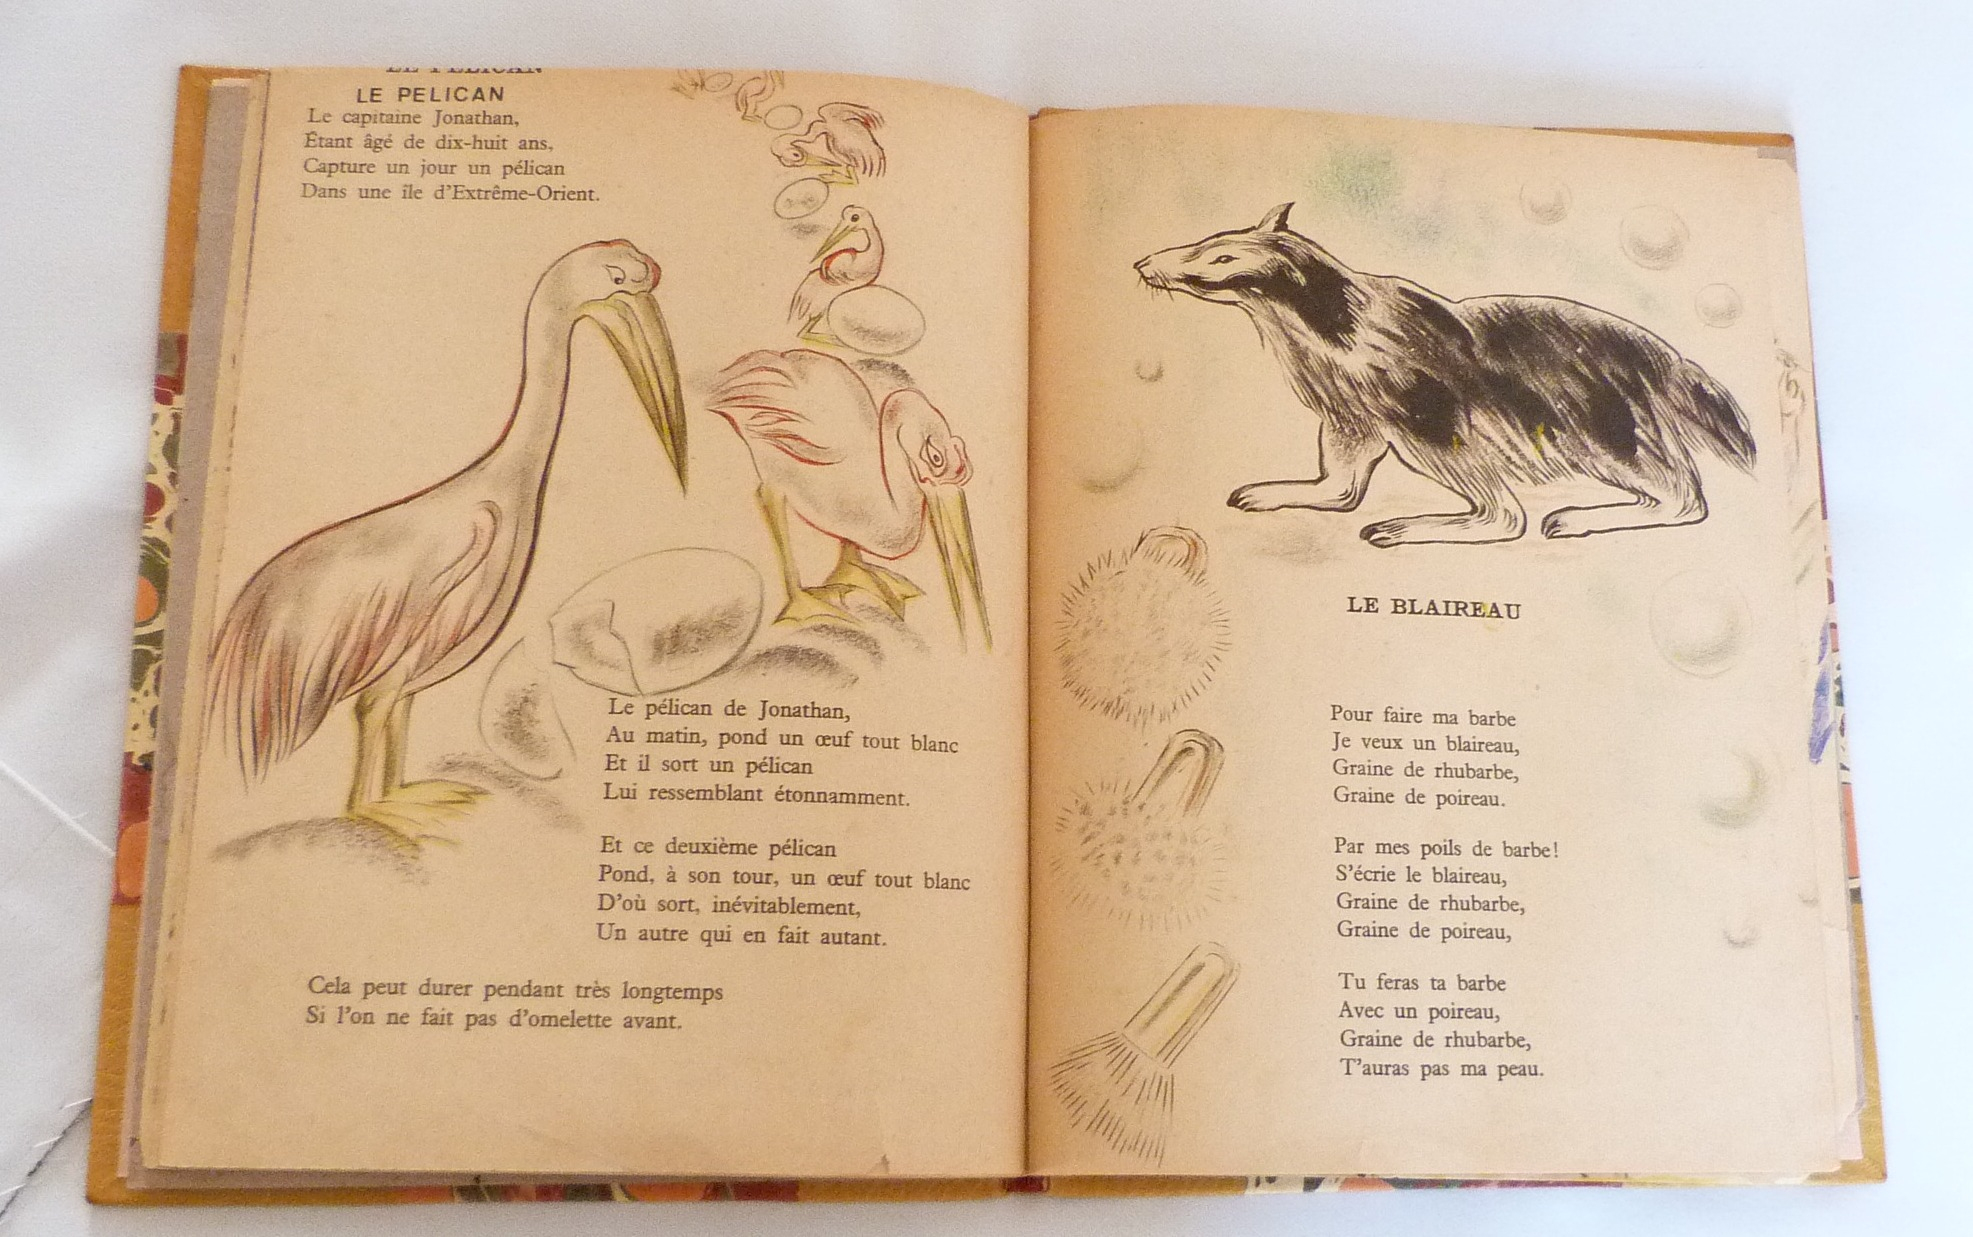 Chantefables De Robert Desnos - Reliure D'art Dare destiné Poème De Robert Desnos